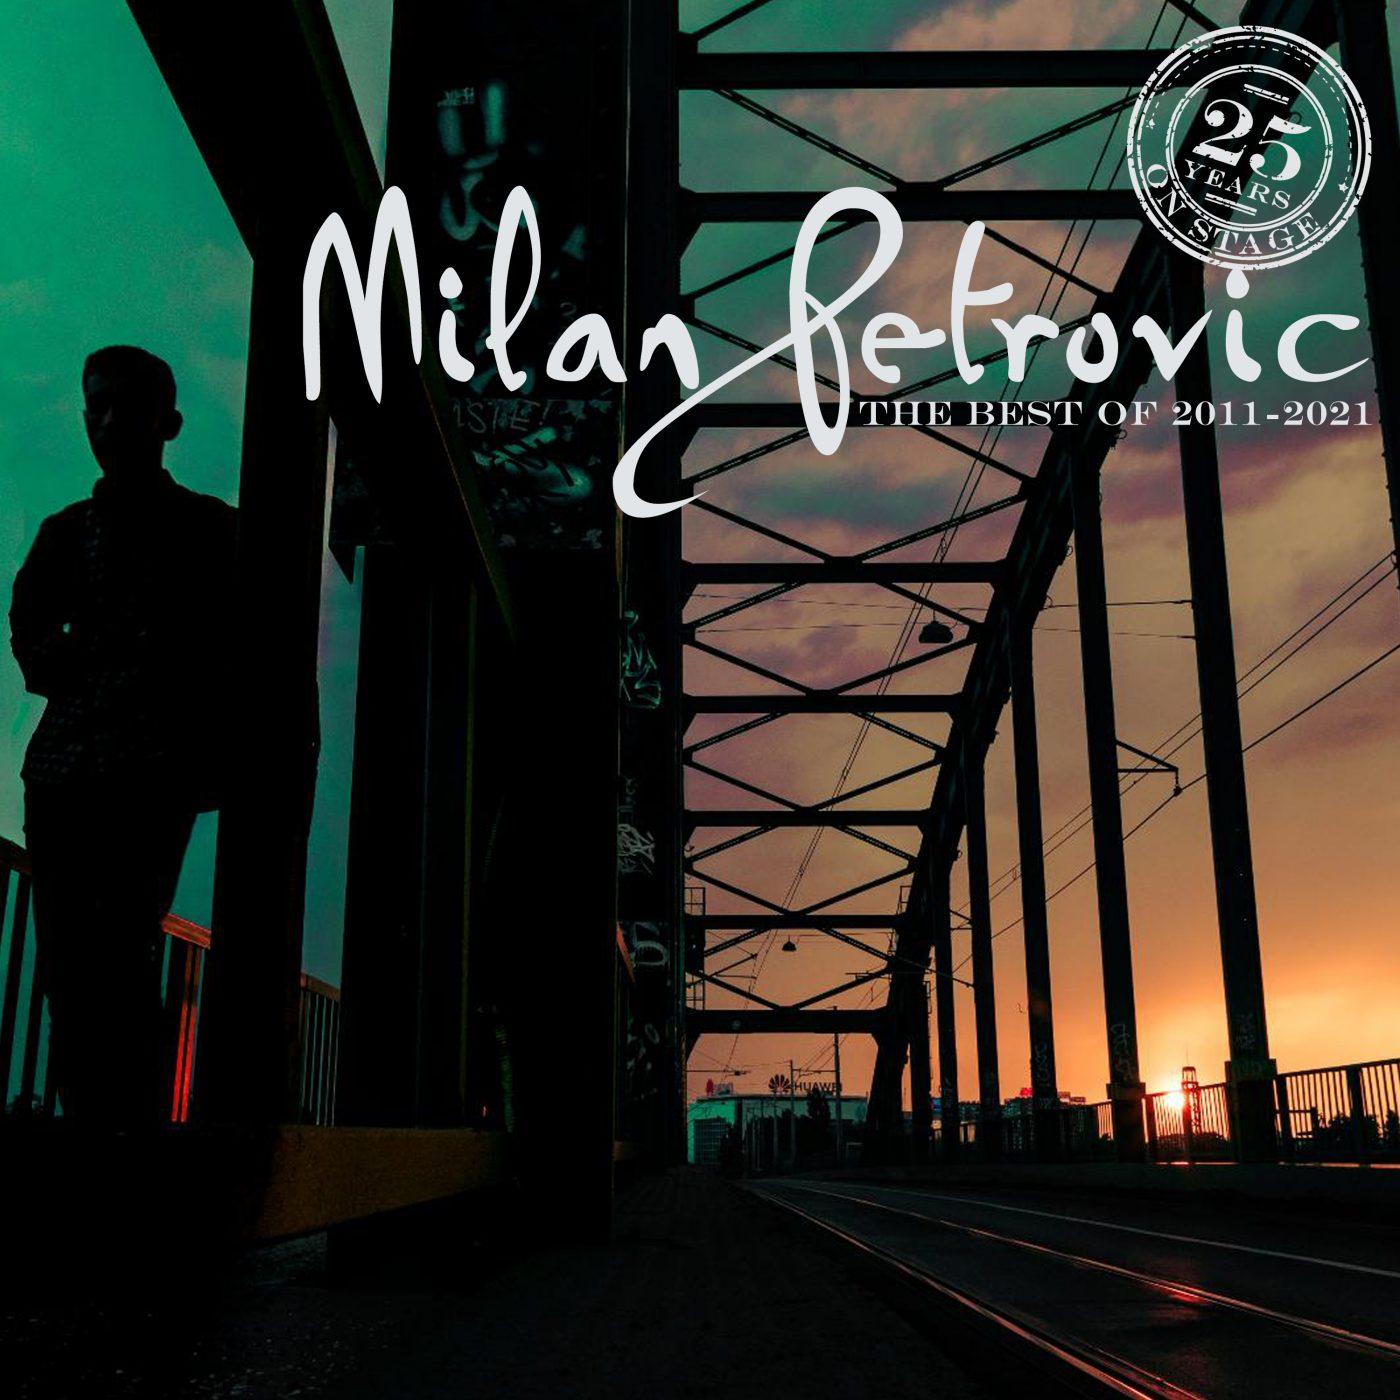 Milan Petrovic - Best of 2011-2021